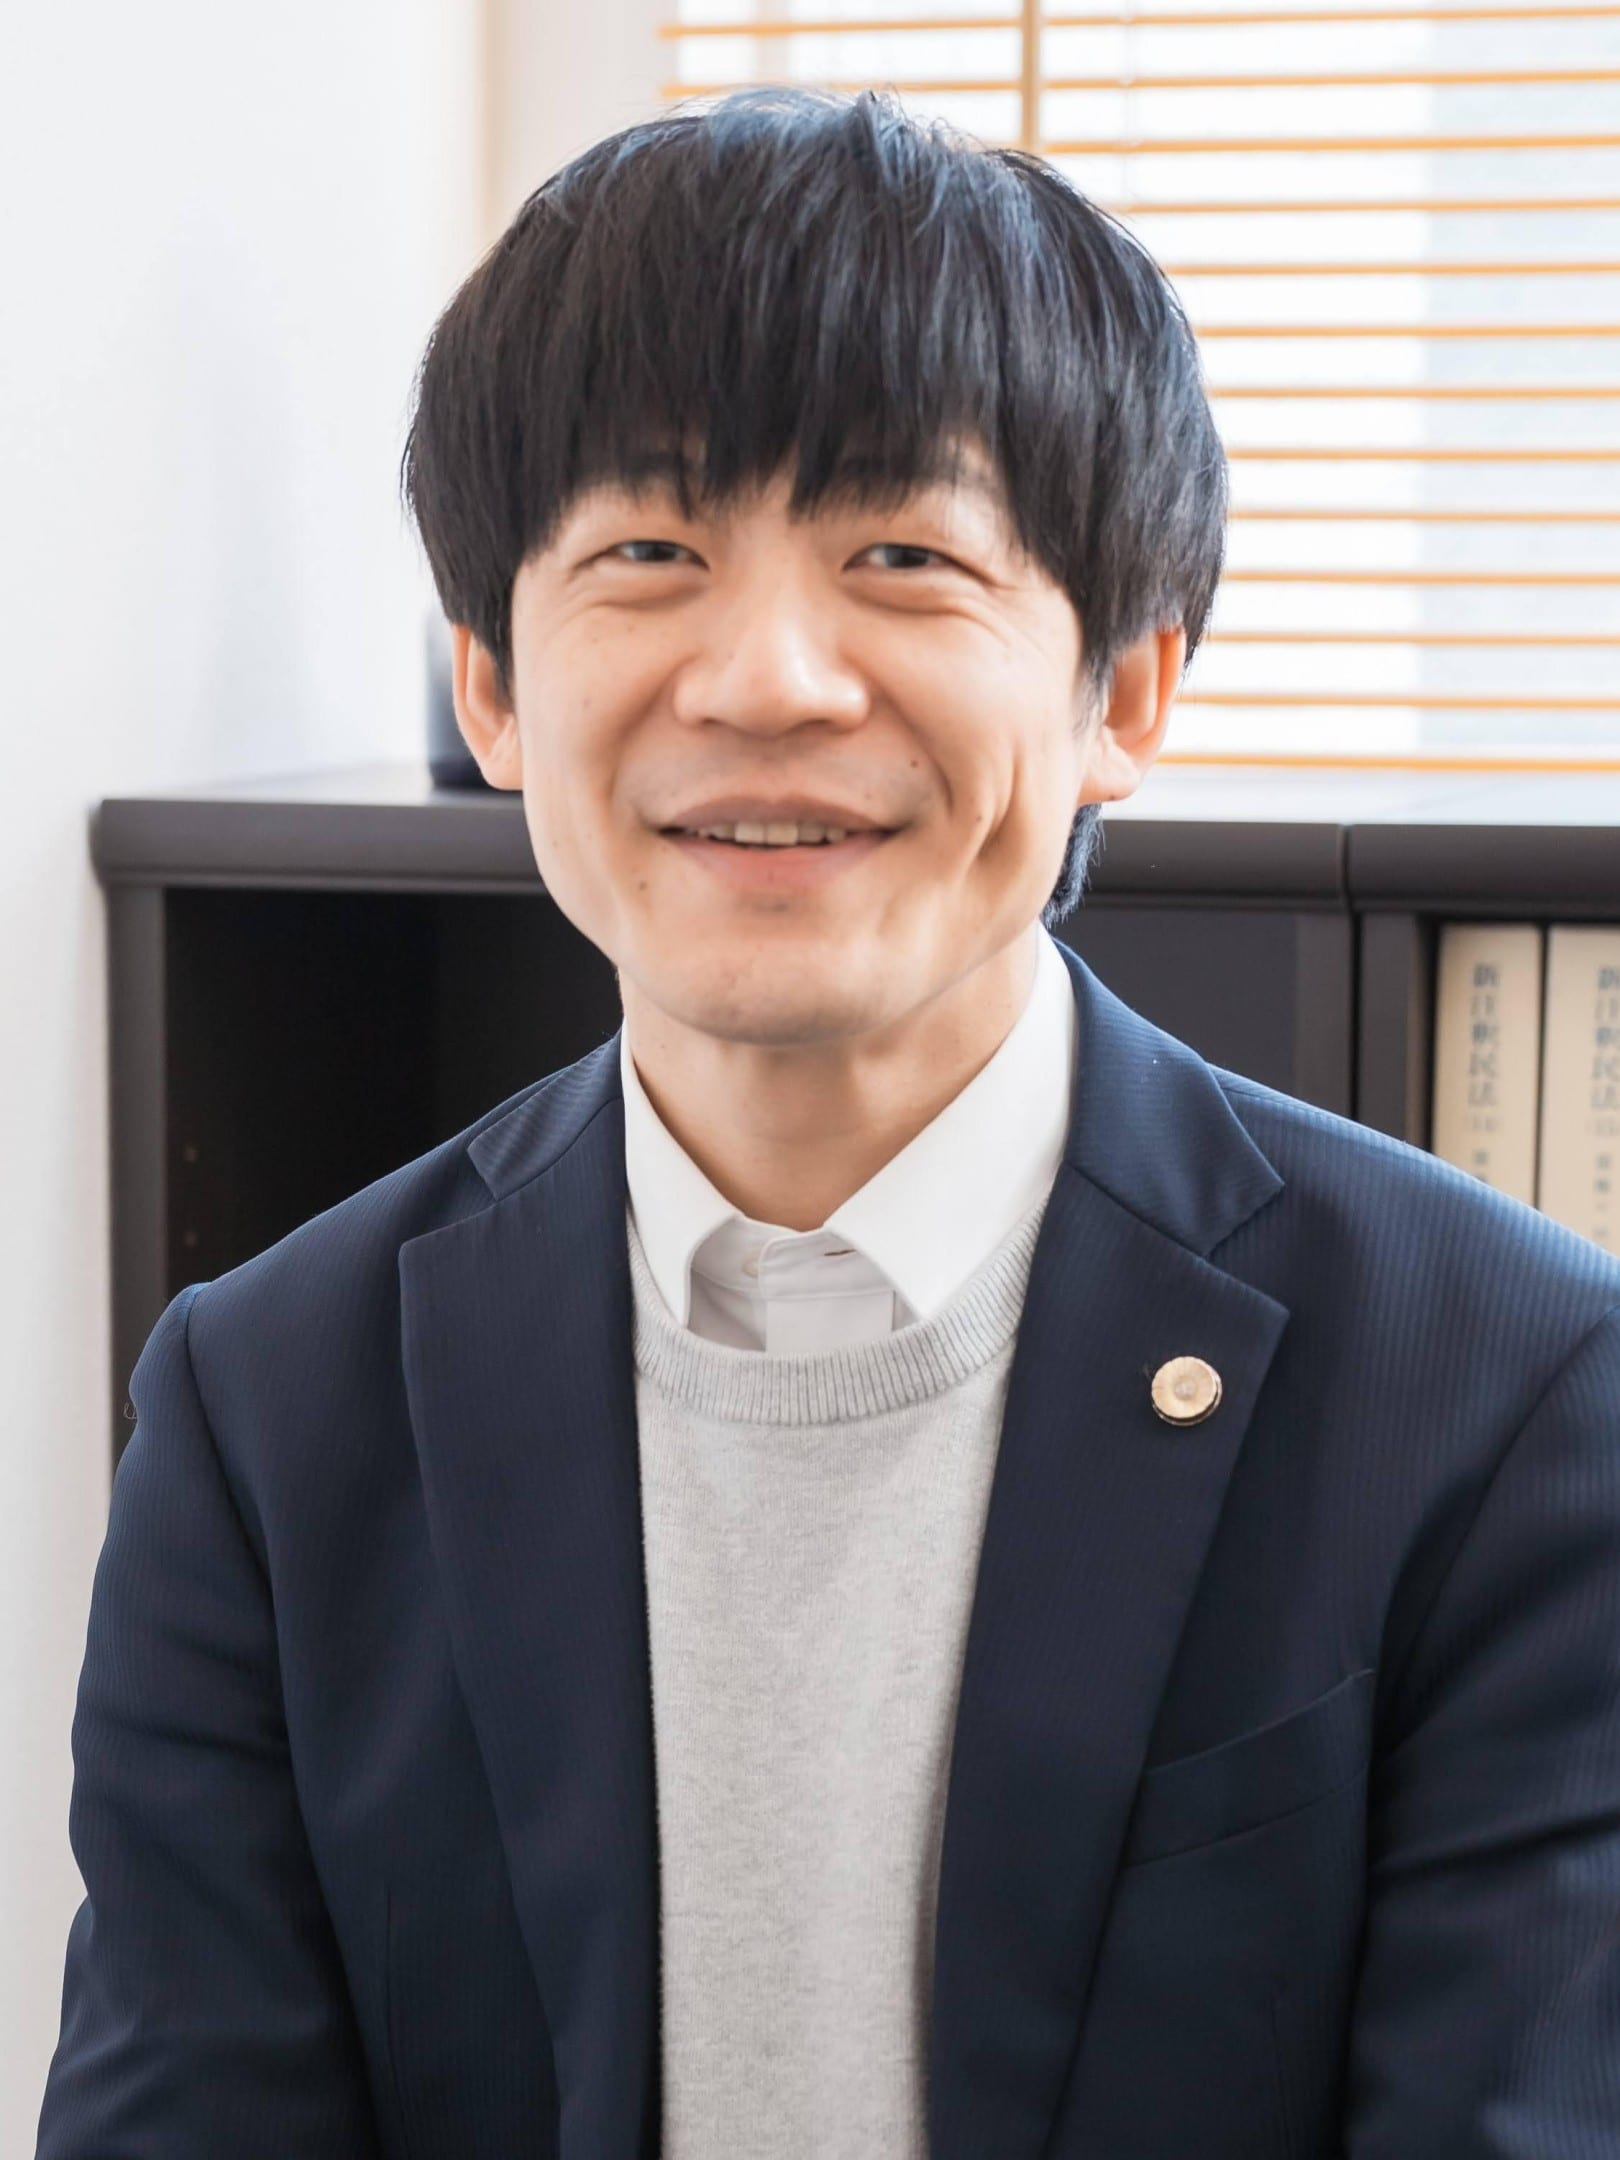 弁護士法人東京スタートアップ法律事務所 高島 宏彰弁護士